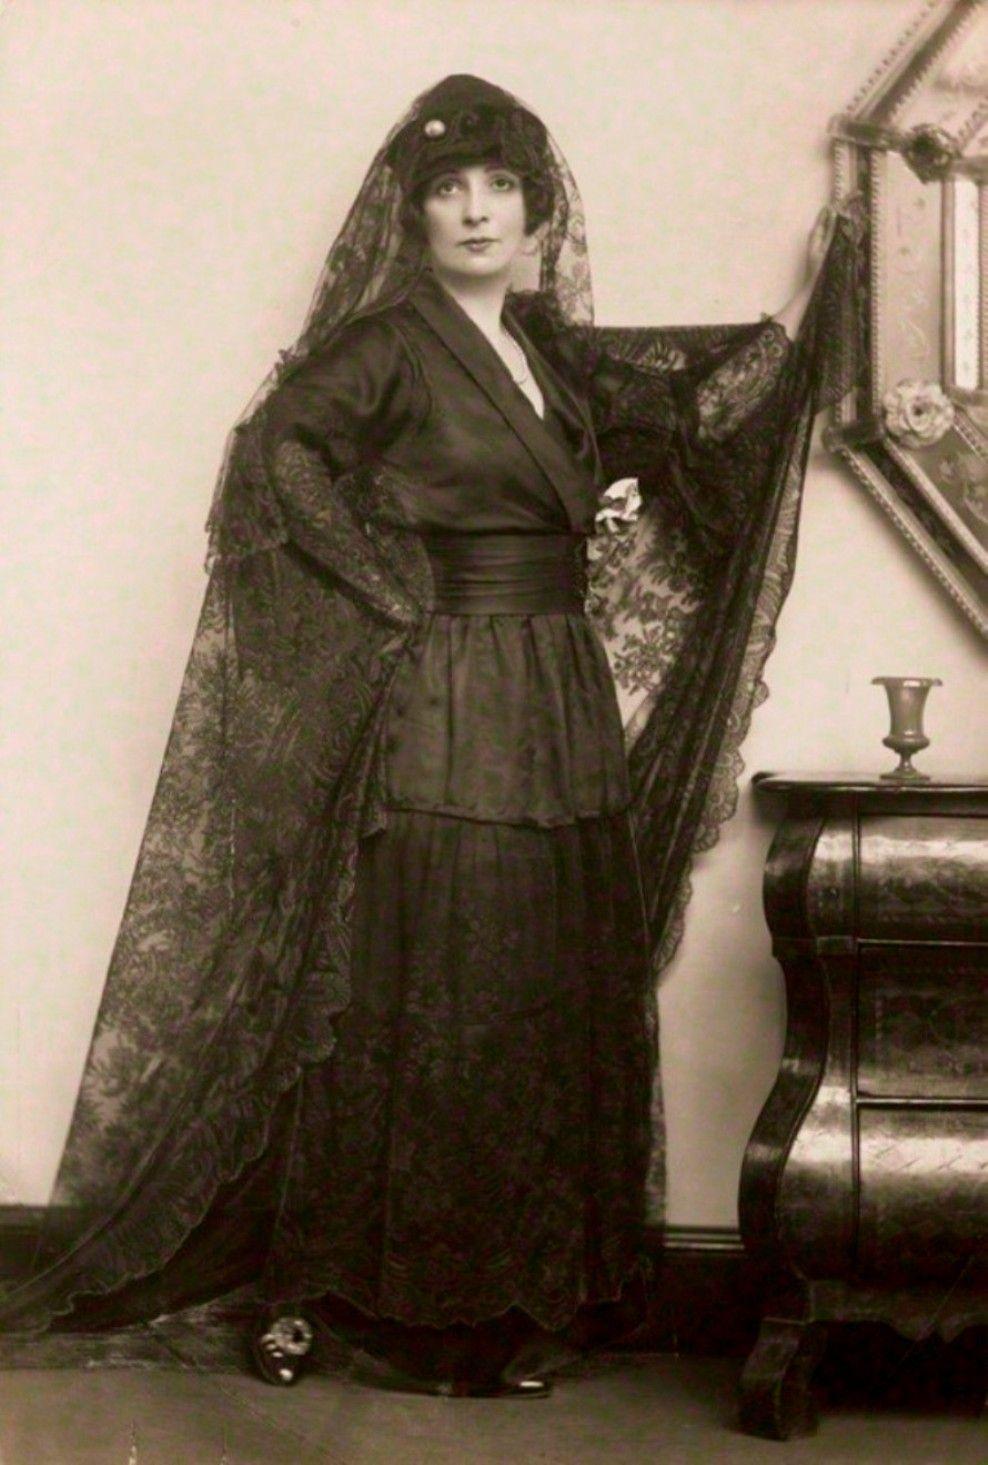 Lady Lavery, wife of Irish artist Sir John Lavery